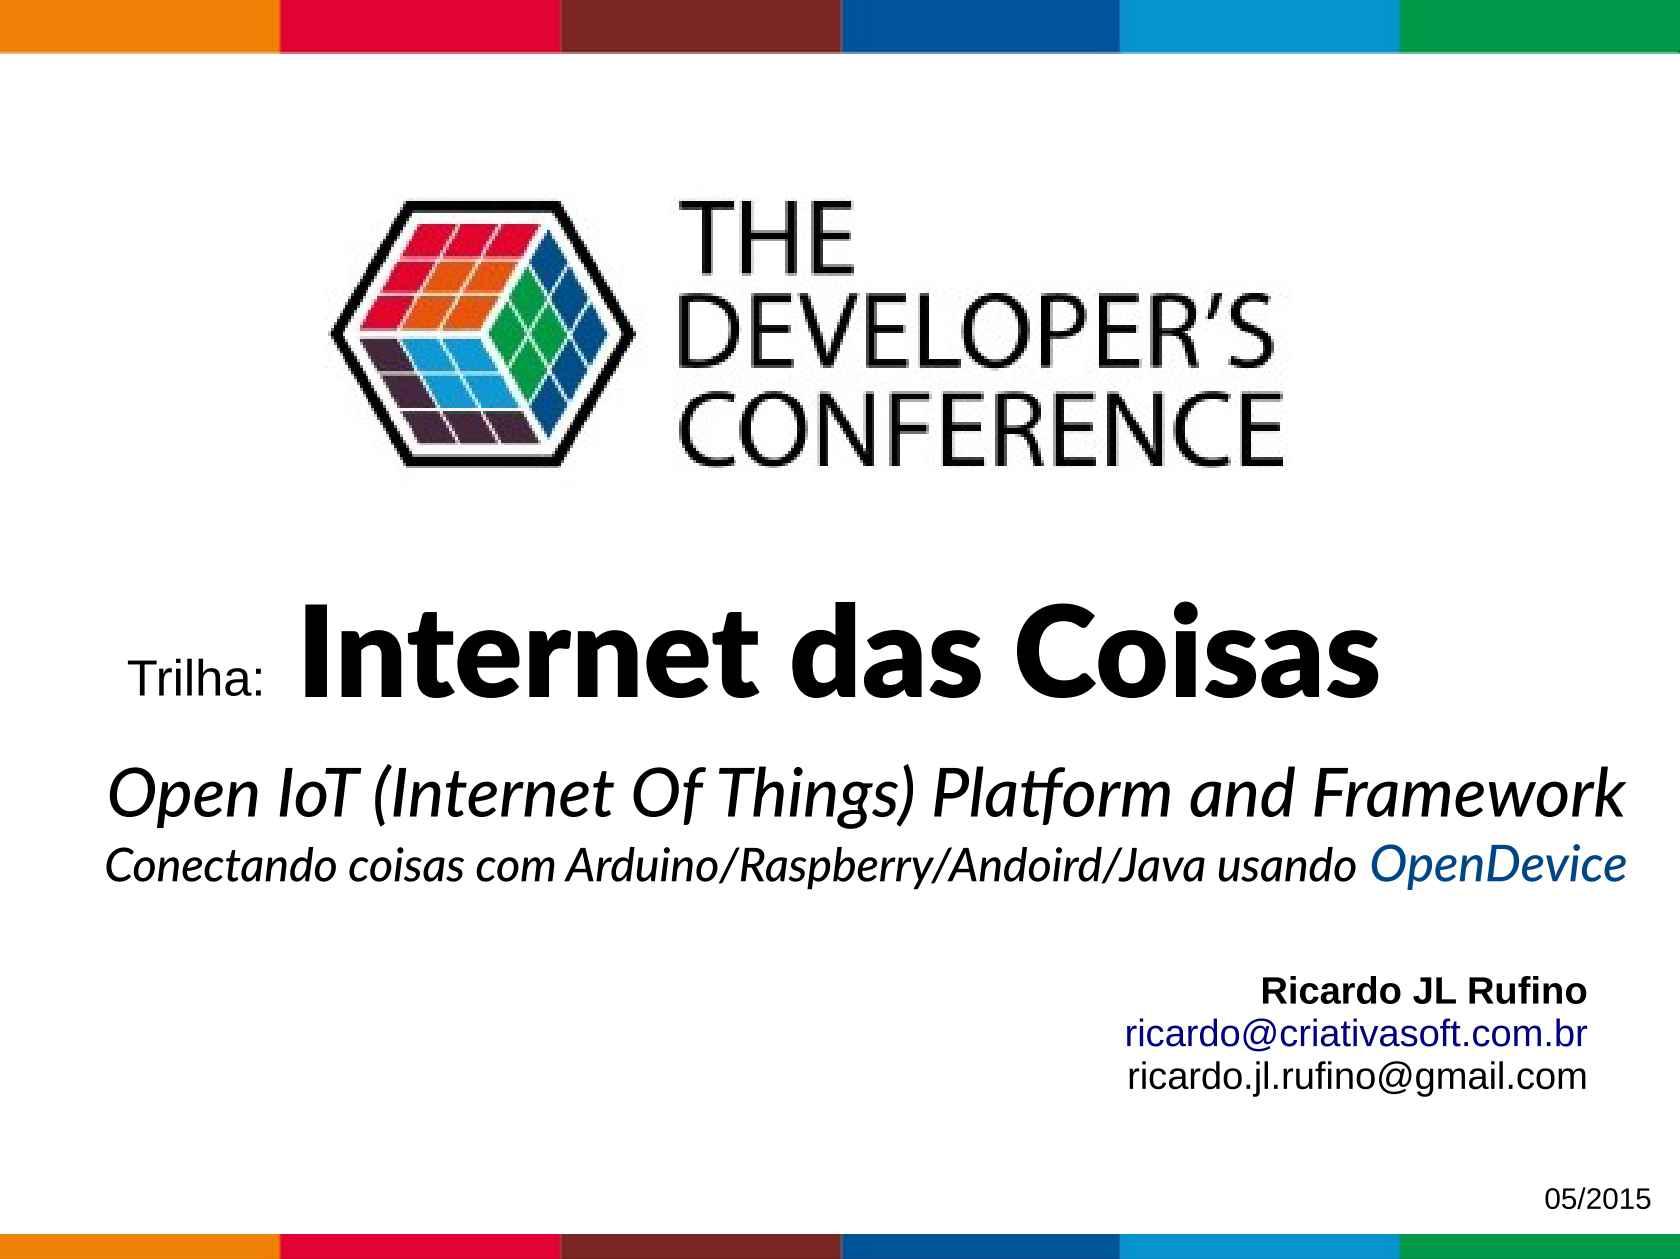 OpenDevice - Conectando coisas com Arduino/Raspberry/Android/Java